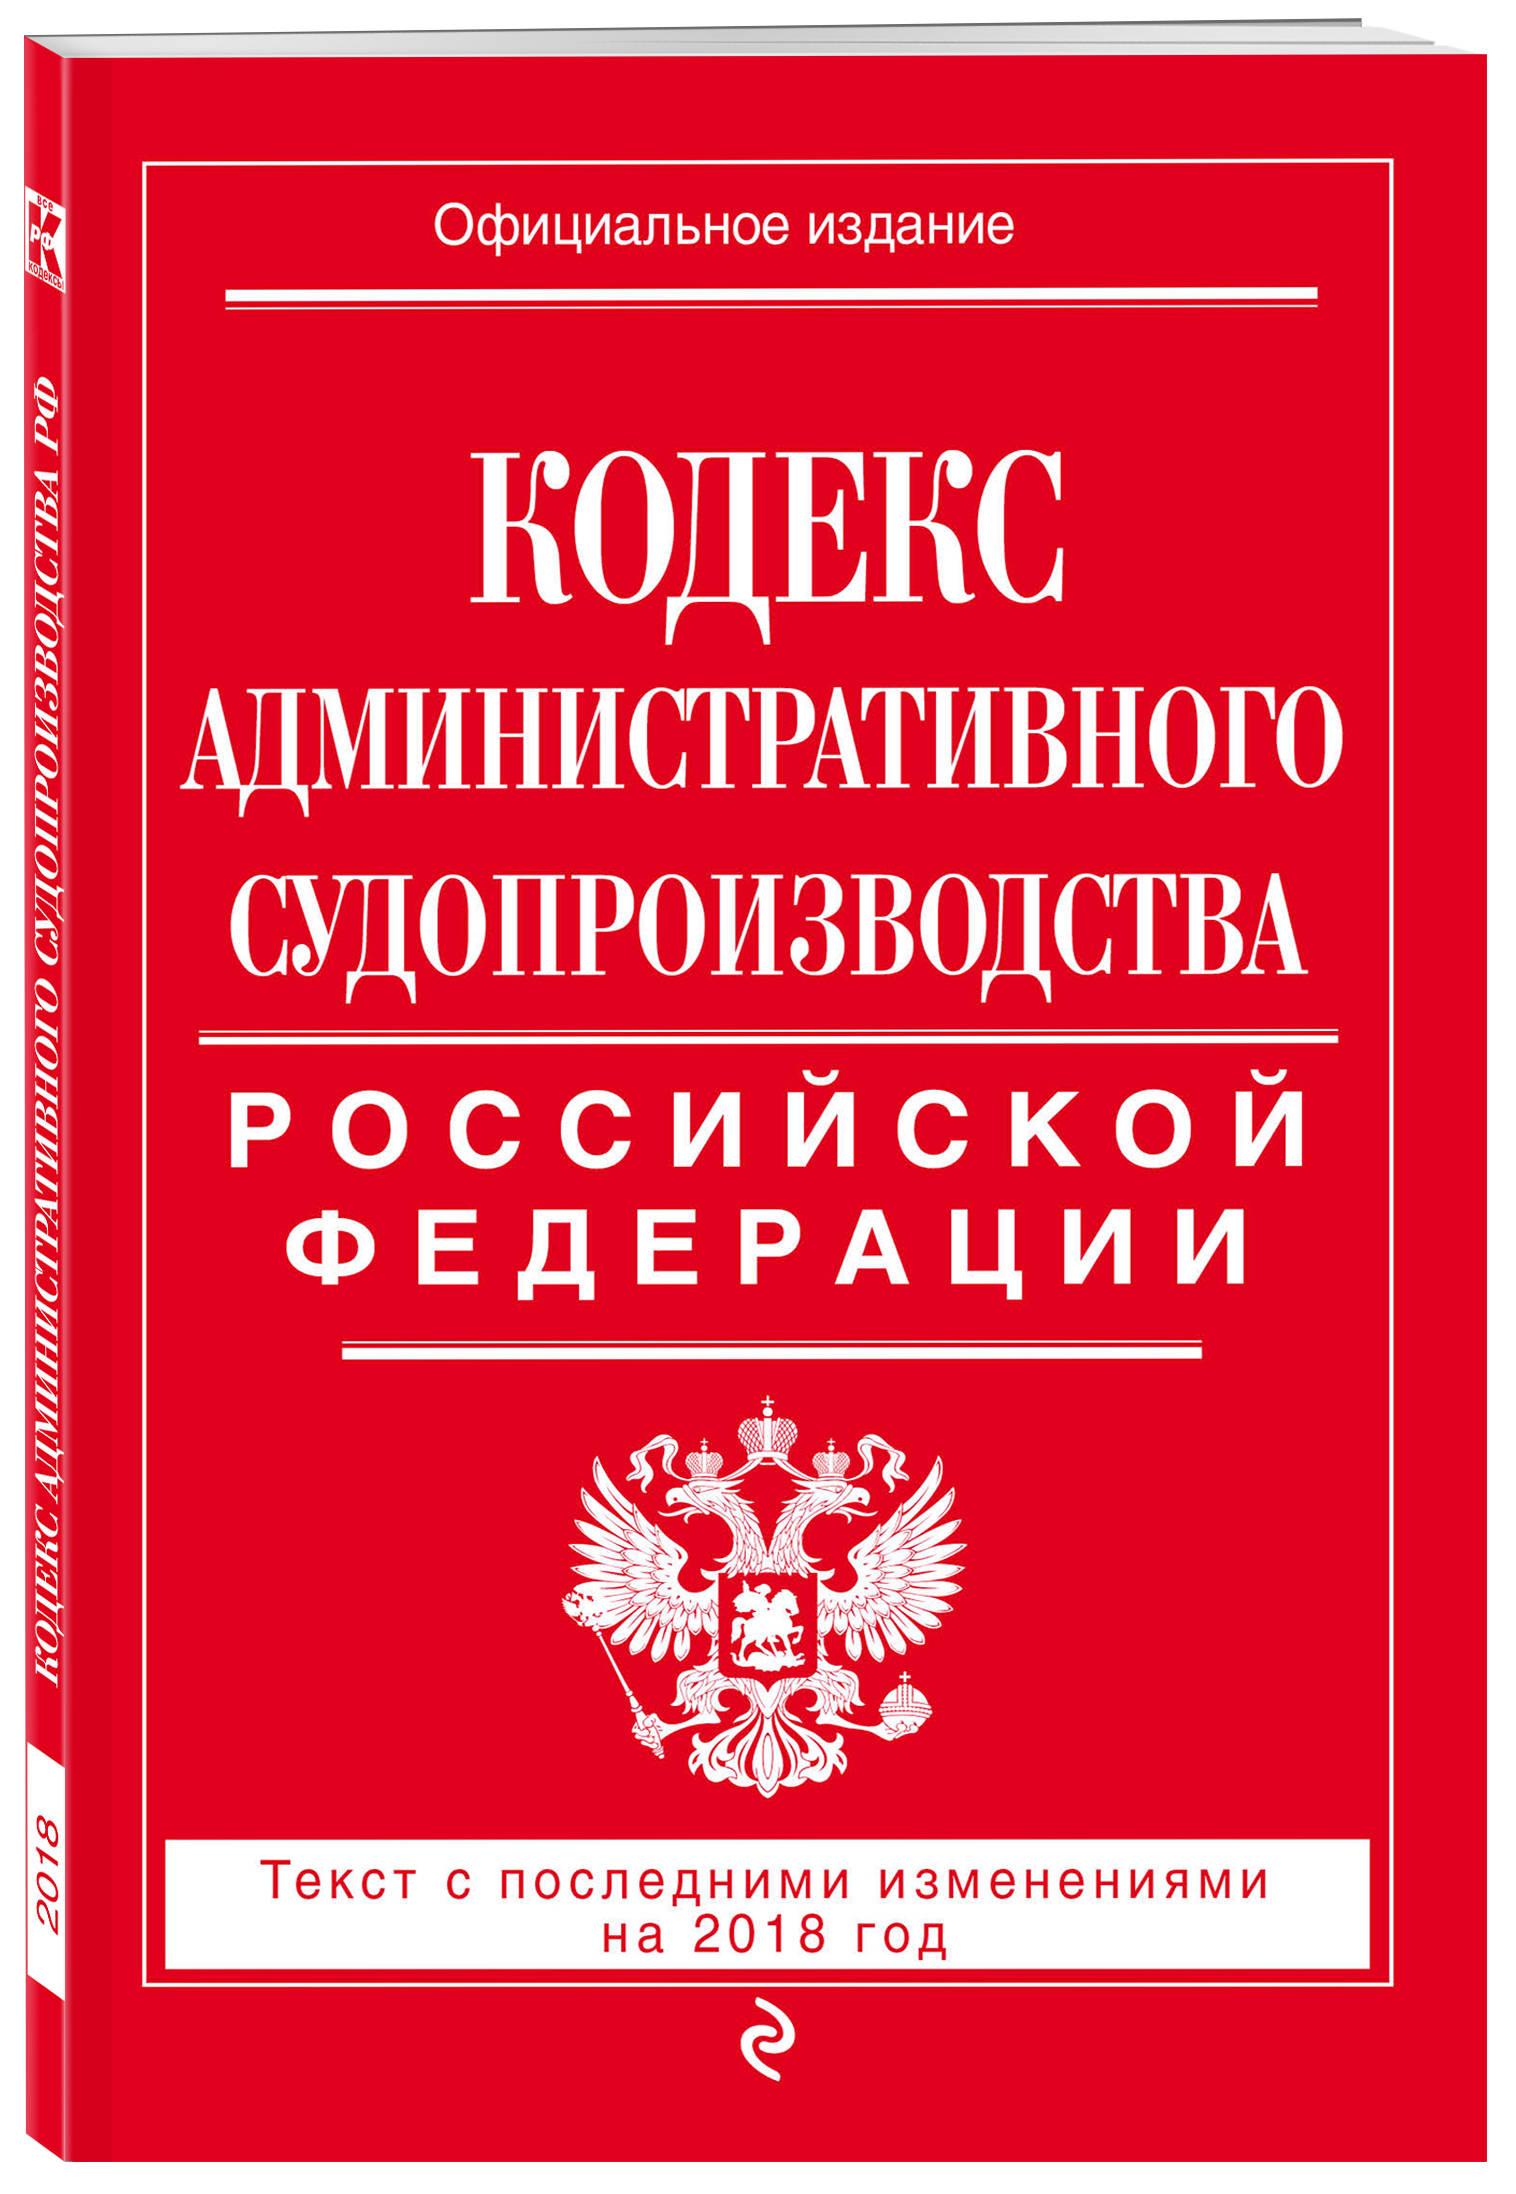 Кодекс административного судопроизводства РФ: текст с посл. изм. на 2018 год кодекс административного судопроизводства рф с изменениями на 2018 год